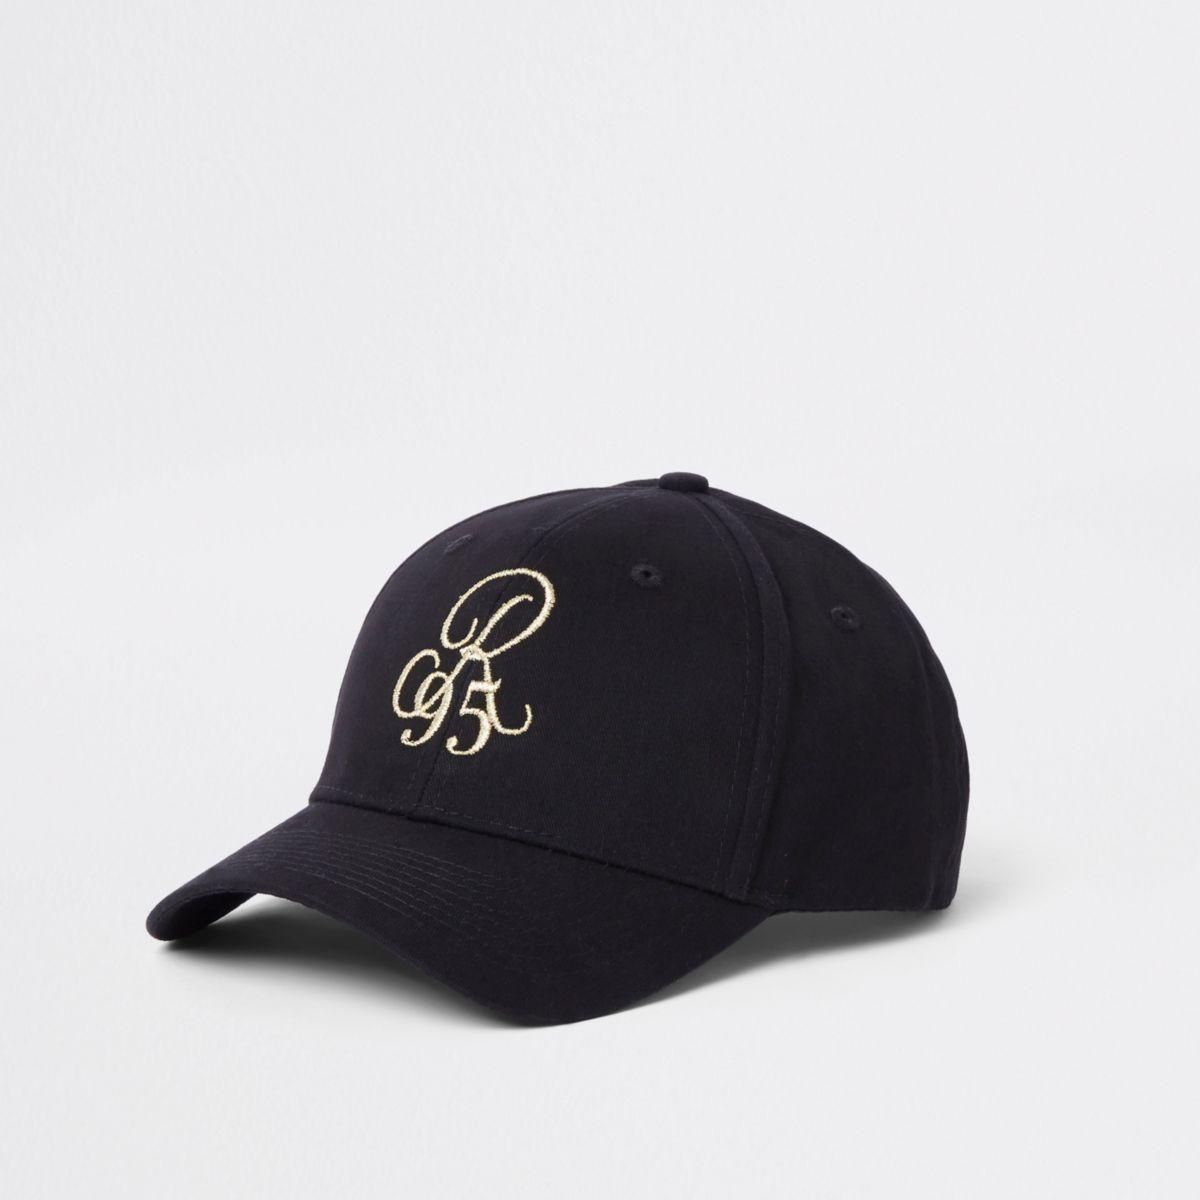 Black 'R95' baseball cap